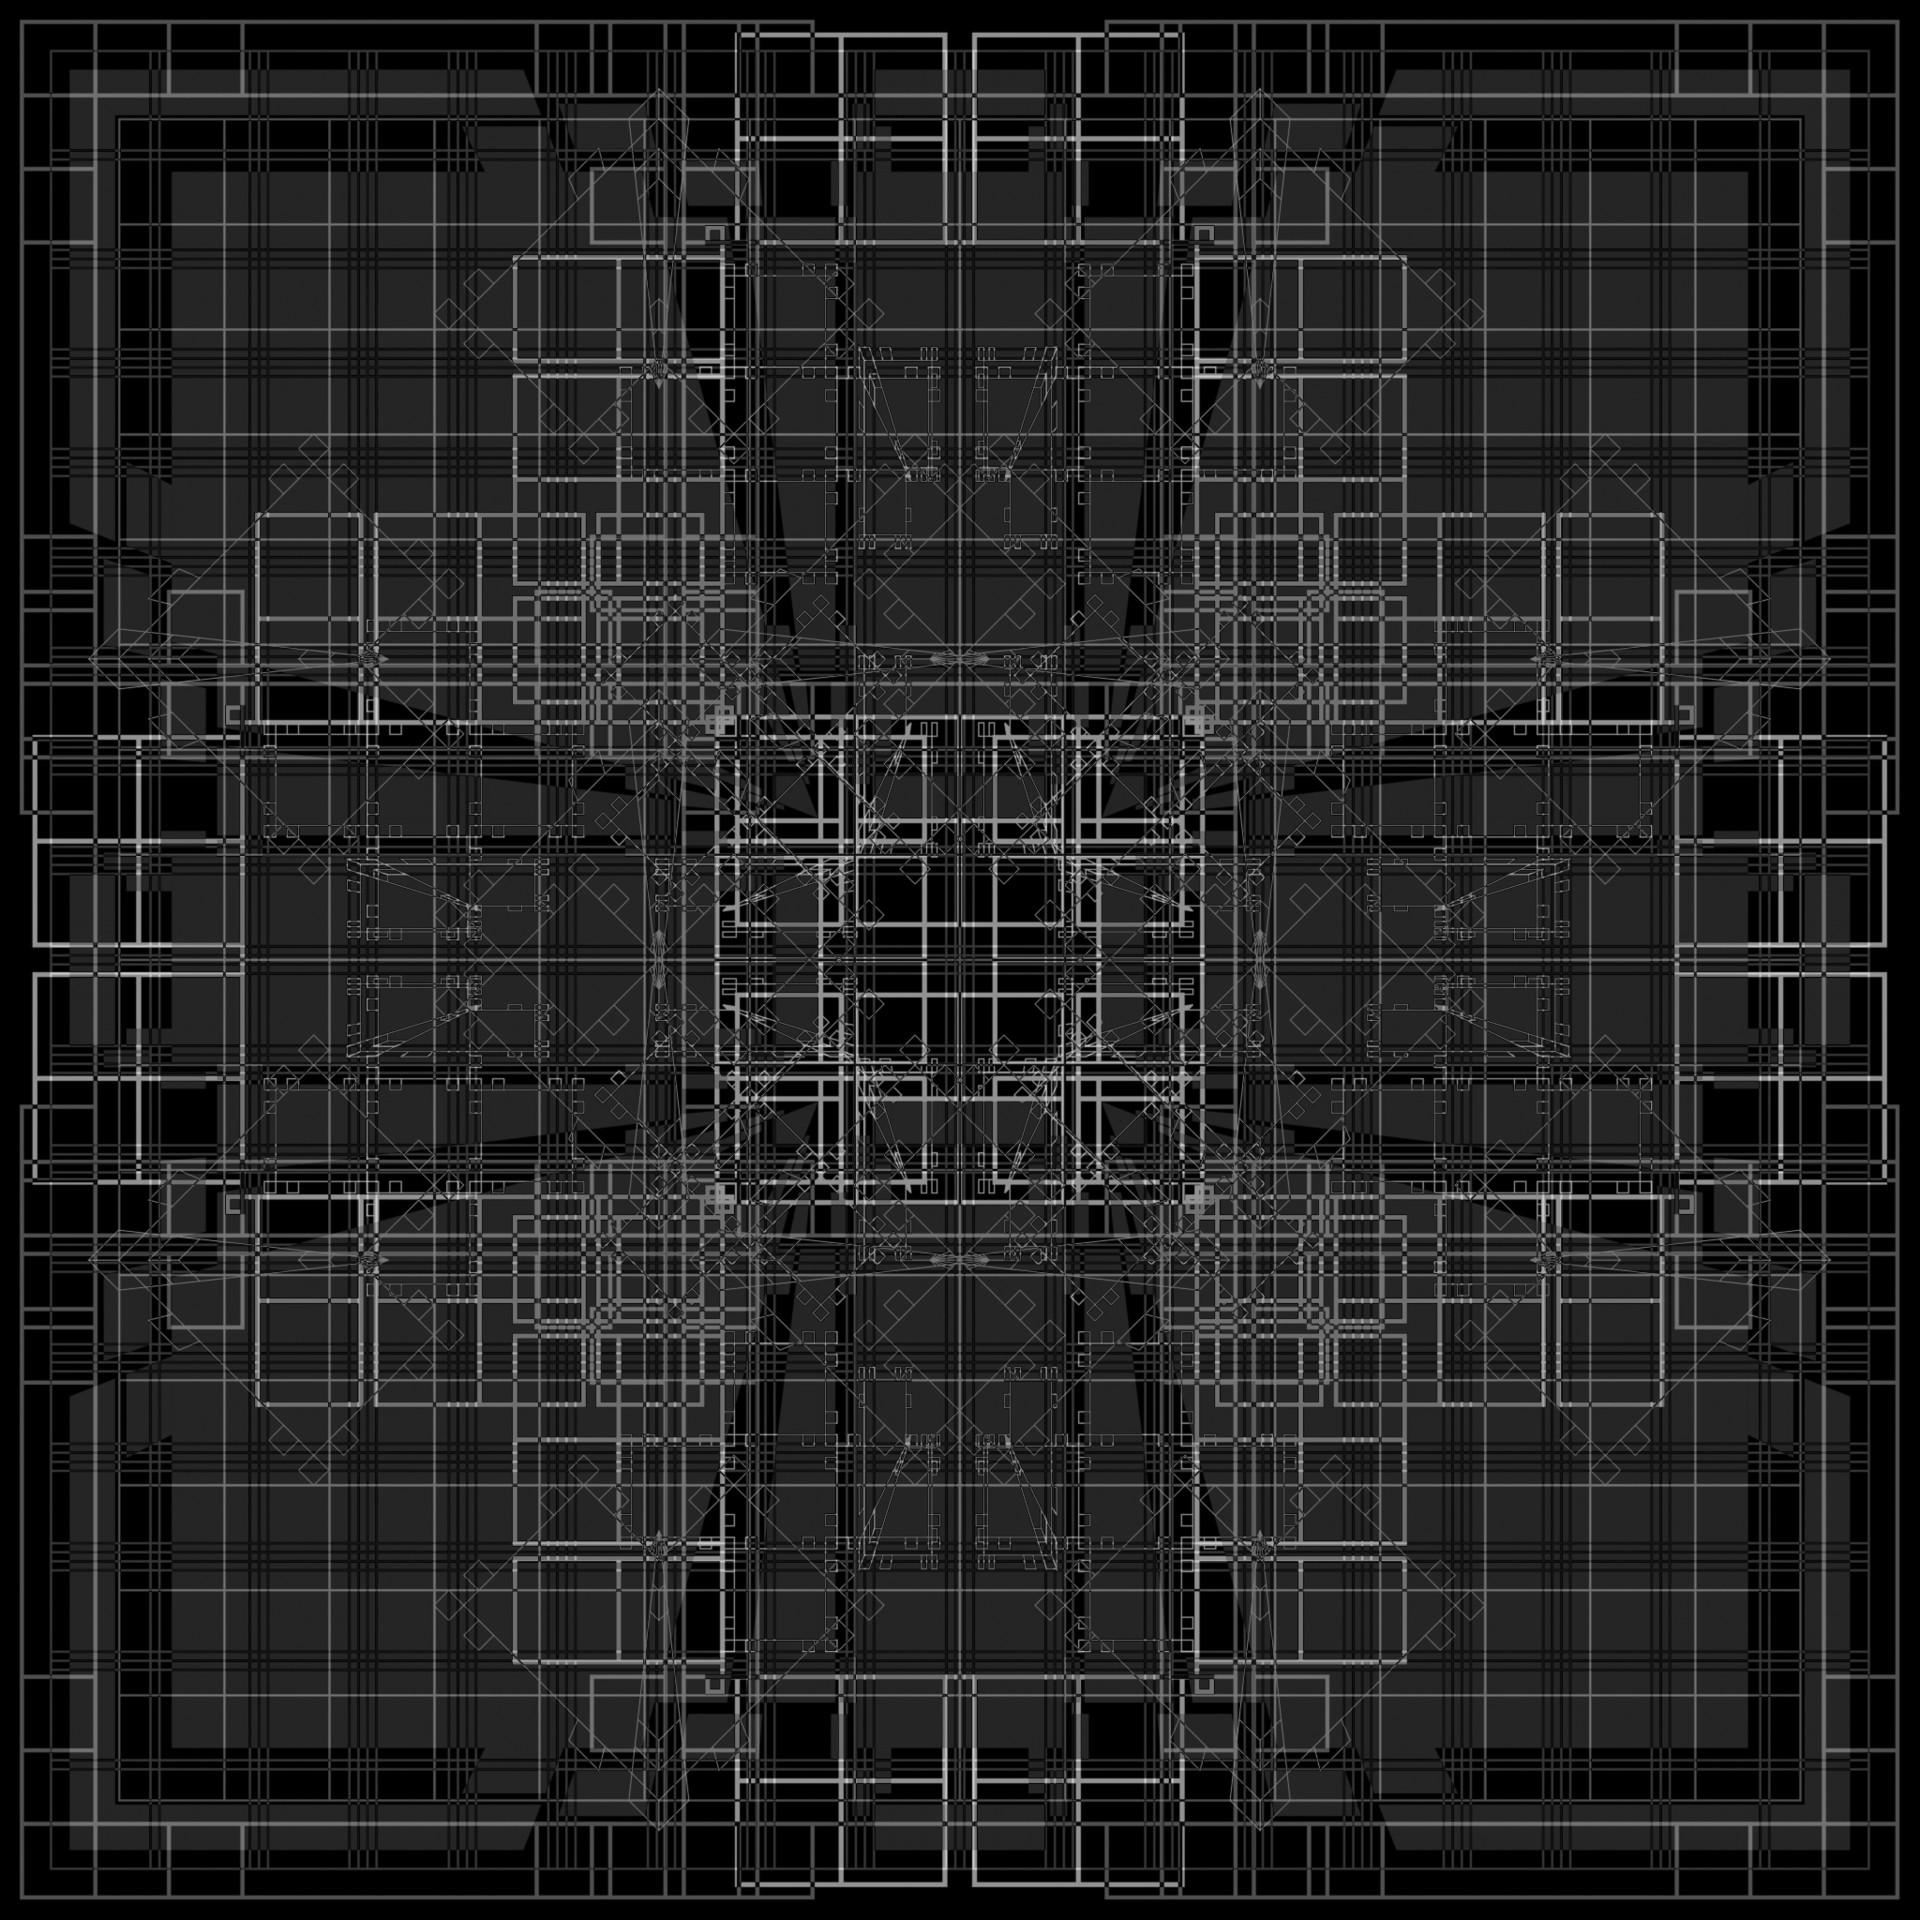 Guido salto 09012016 texturedesign gs 01 displacement